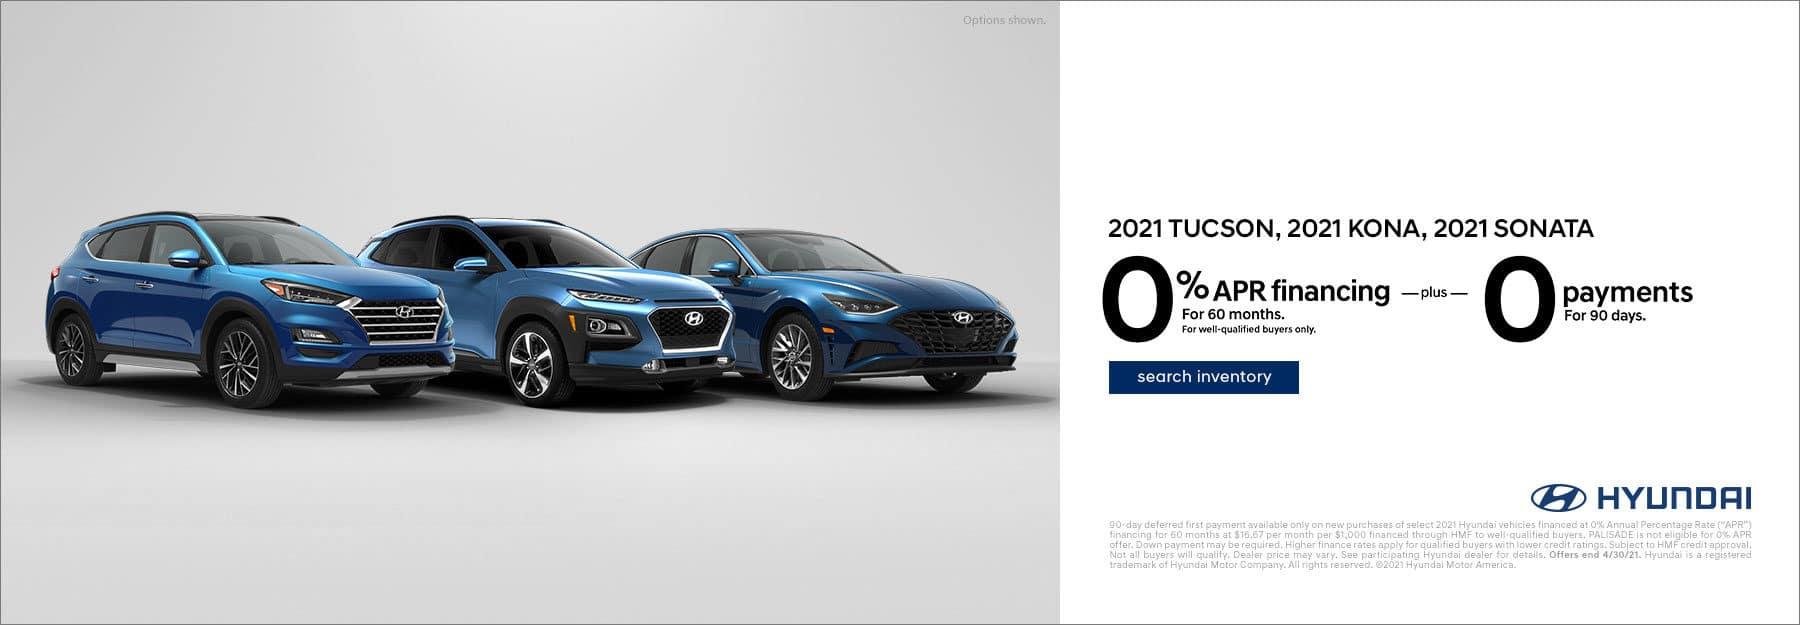 2021 Tucson Kona and Sonata, 0% for 60 months